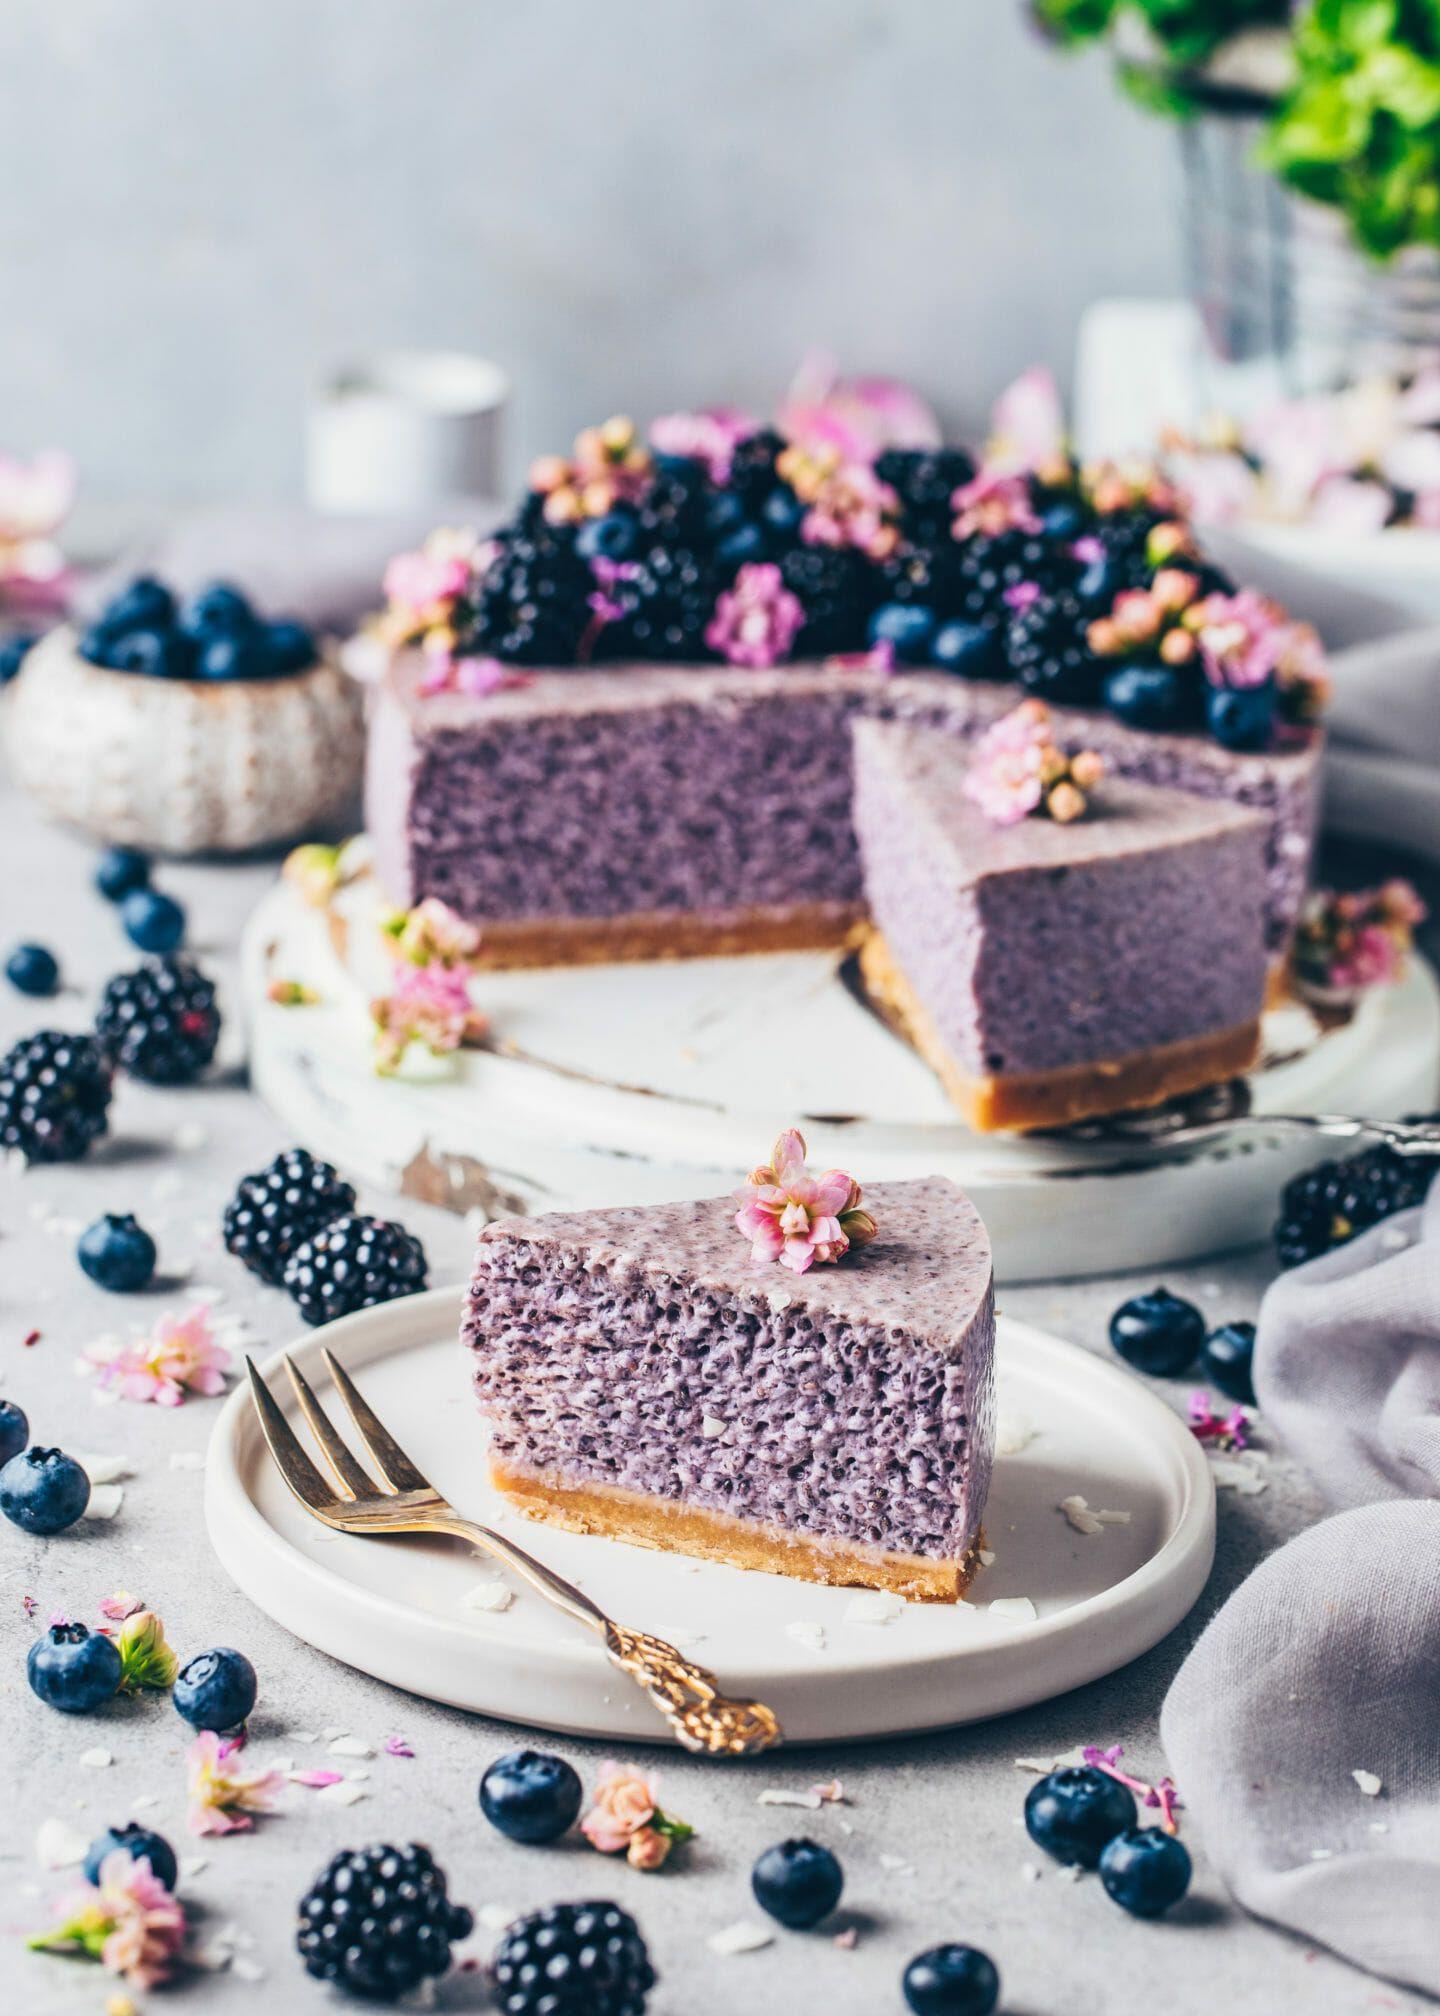 Blaubeer-Chia-Pudding Torte ohne Backen - Bianca Zapatka | Rezepte